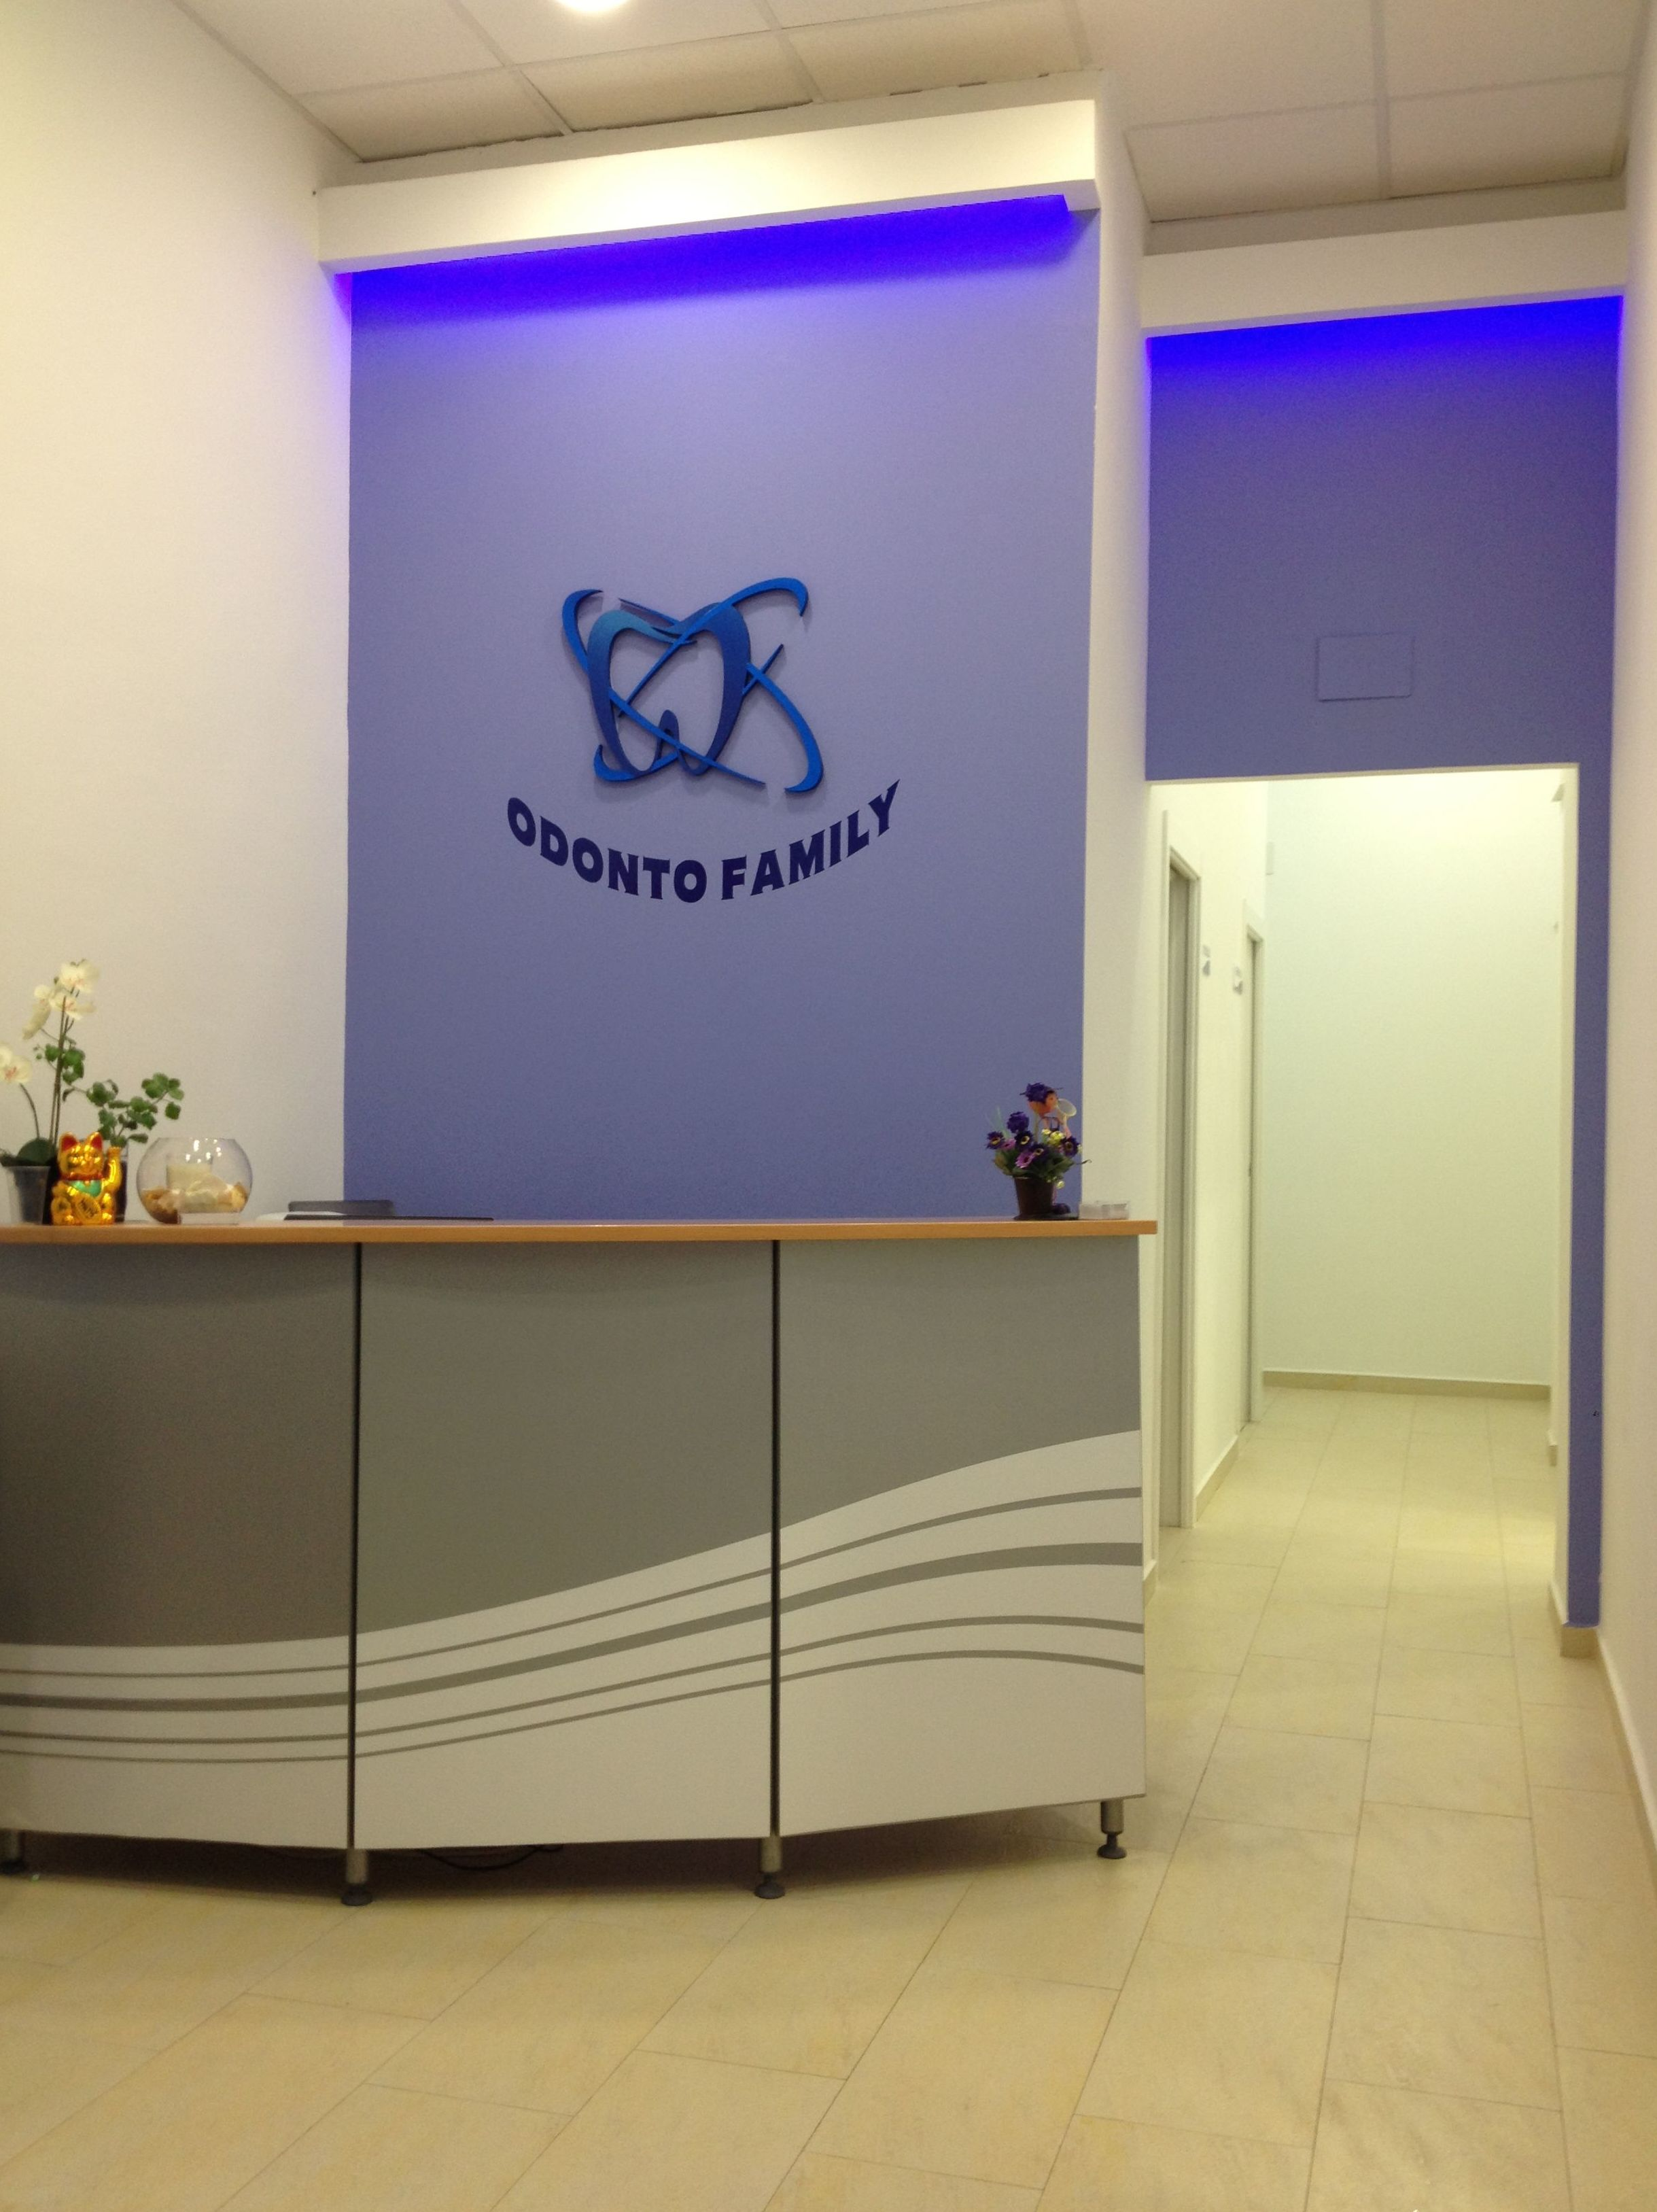 Clinicas de ortodoncia Bilbao